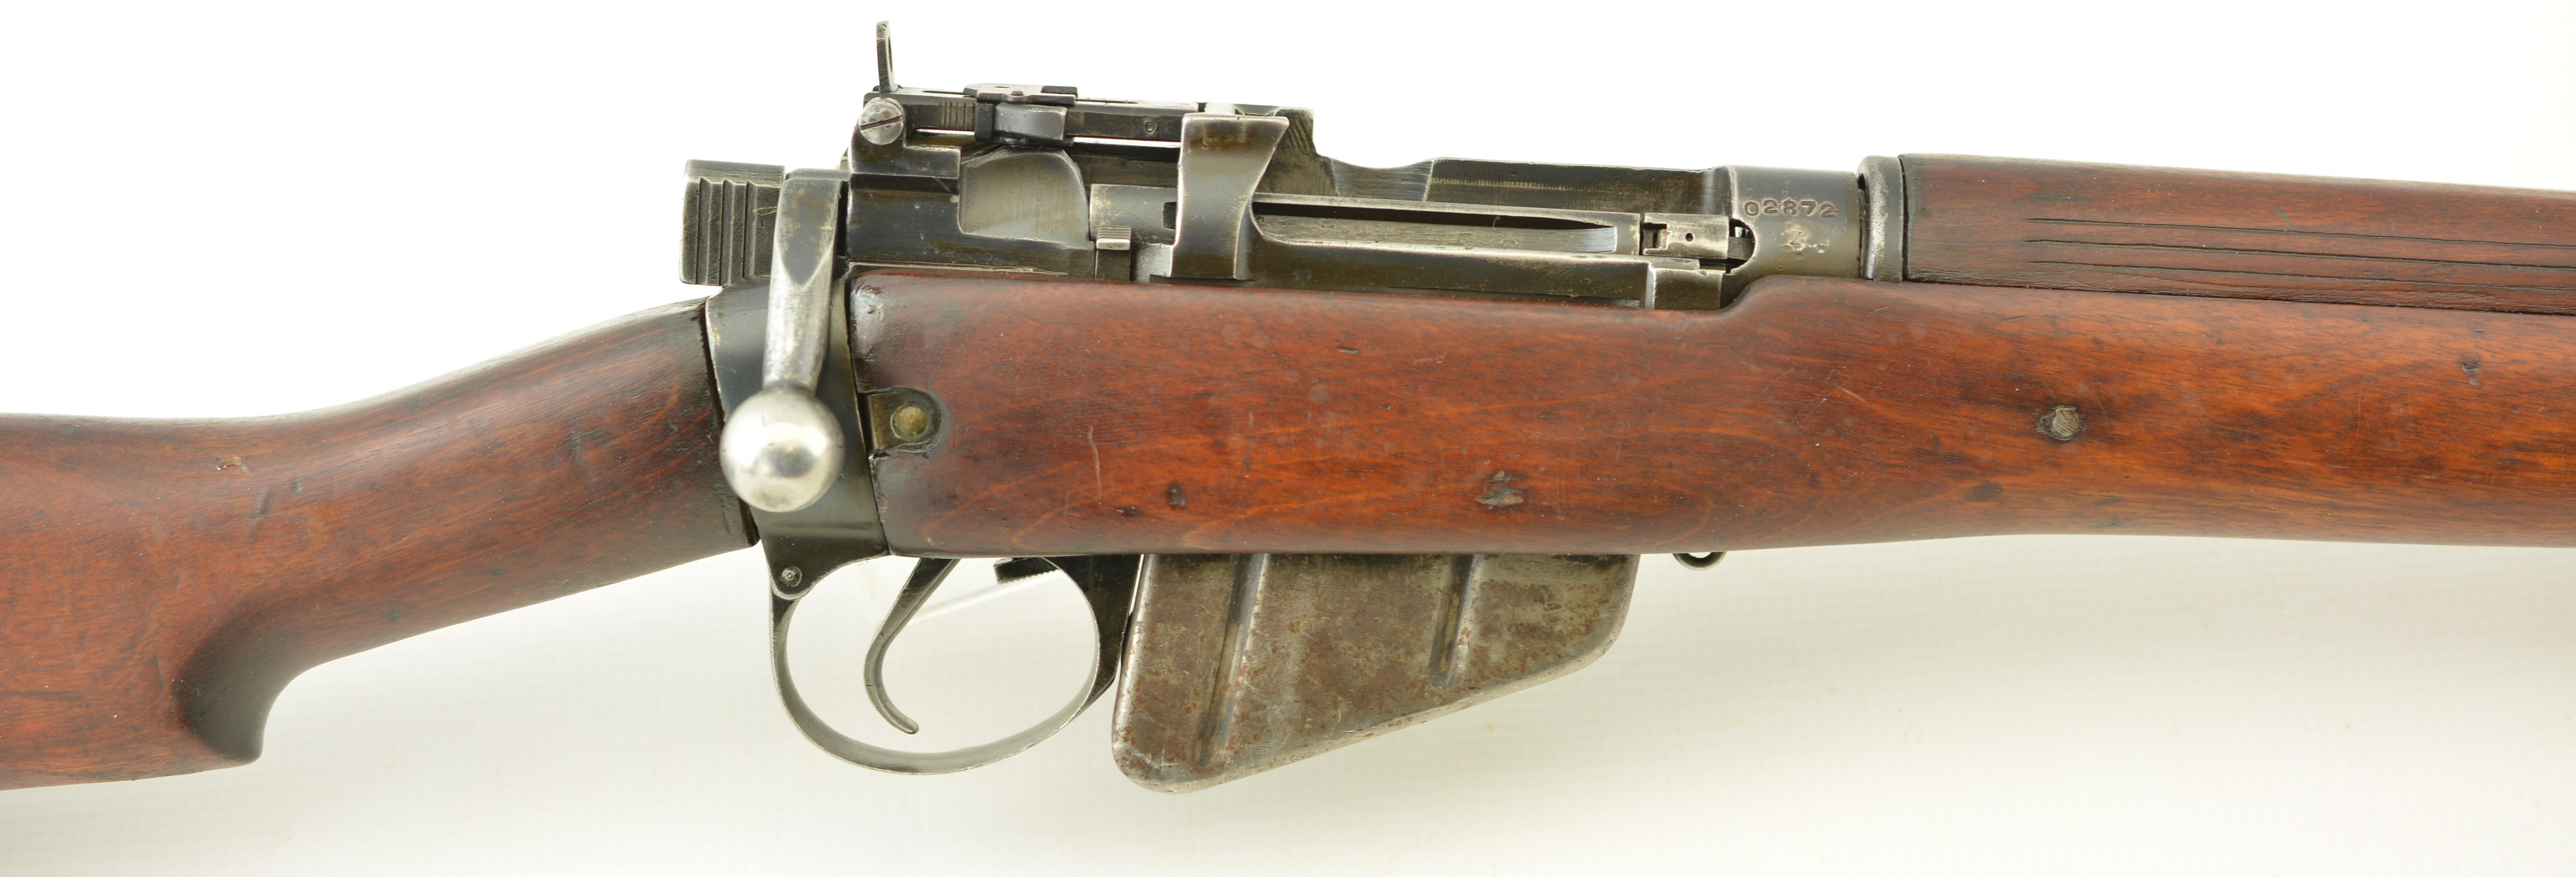 Scarce Ishapore No4 MK1 Lee Enfield Rifle